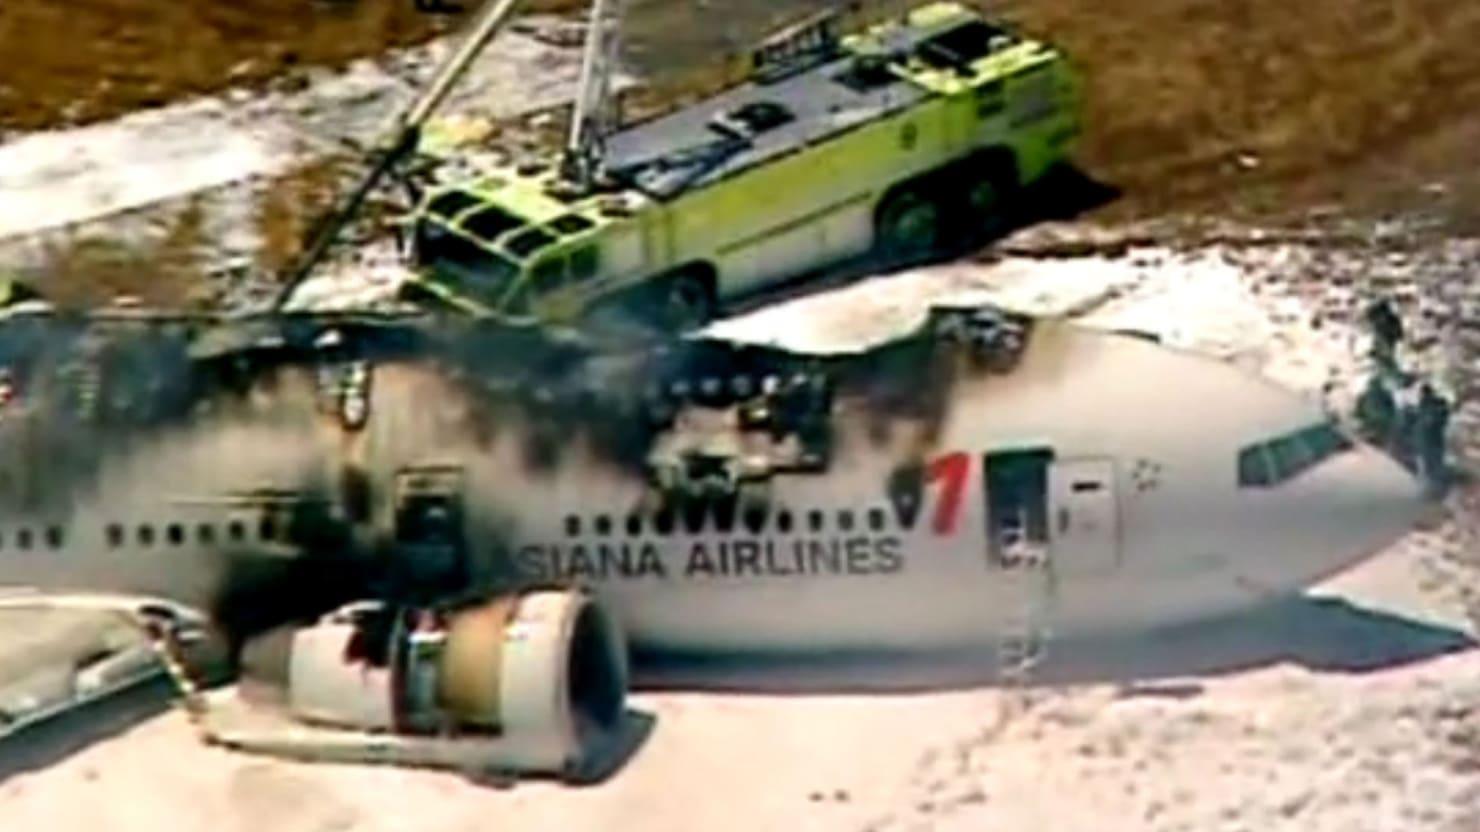 San Francisco Airplane Crash Landing: What Happened?